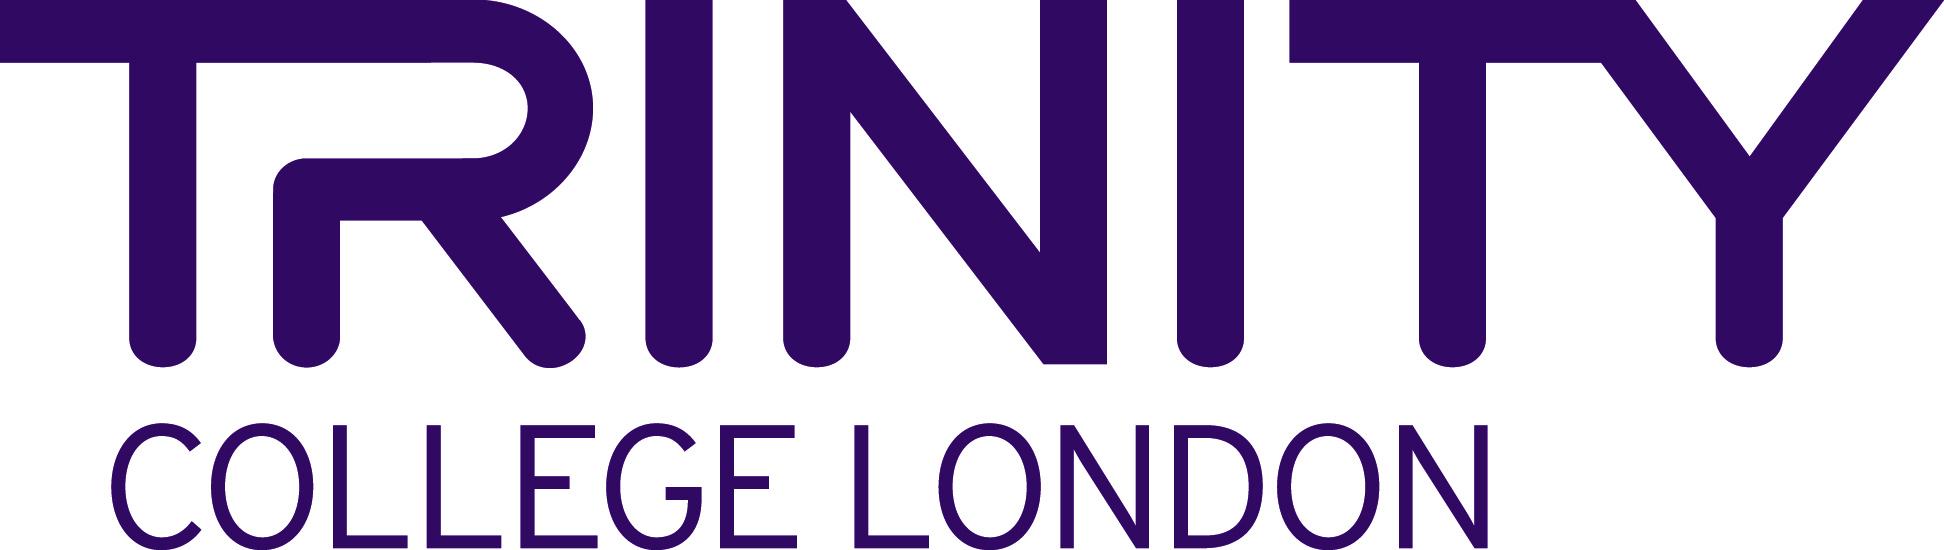 TCL purple cmyk logo (550pixels high) (new purple)